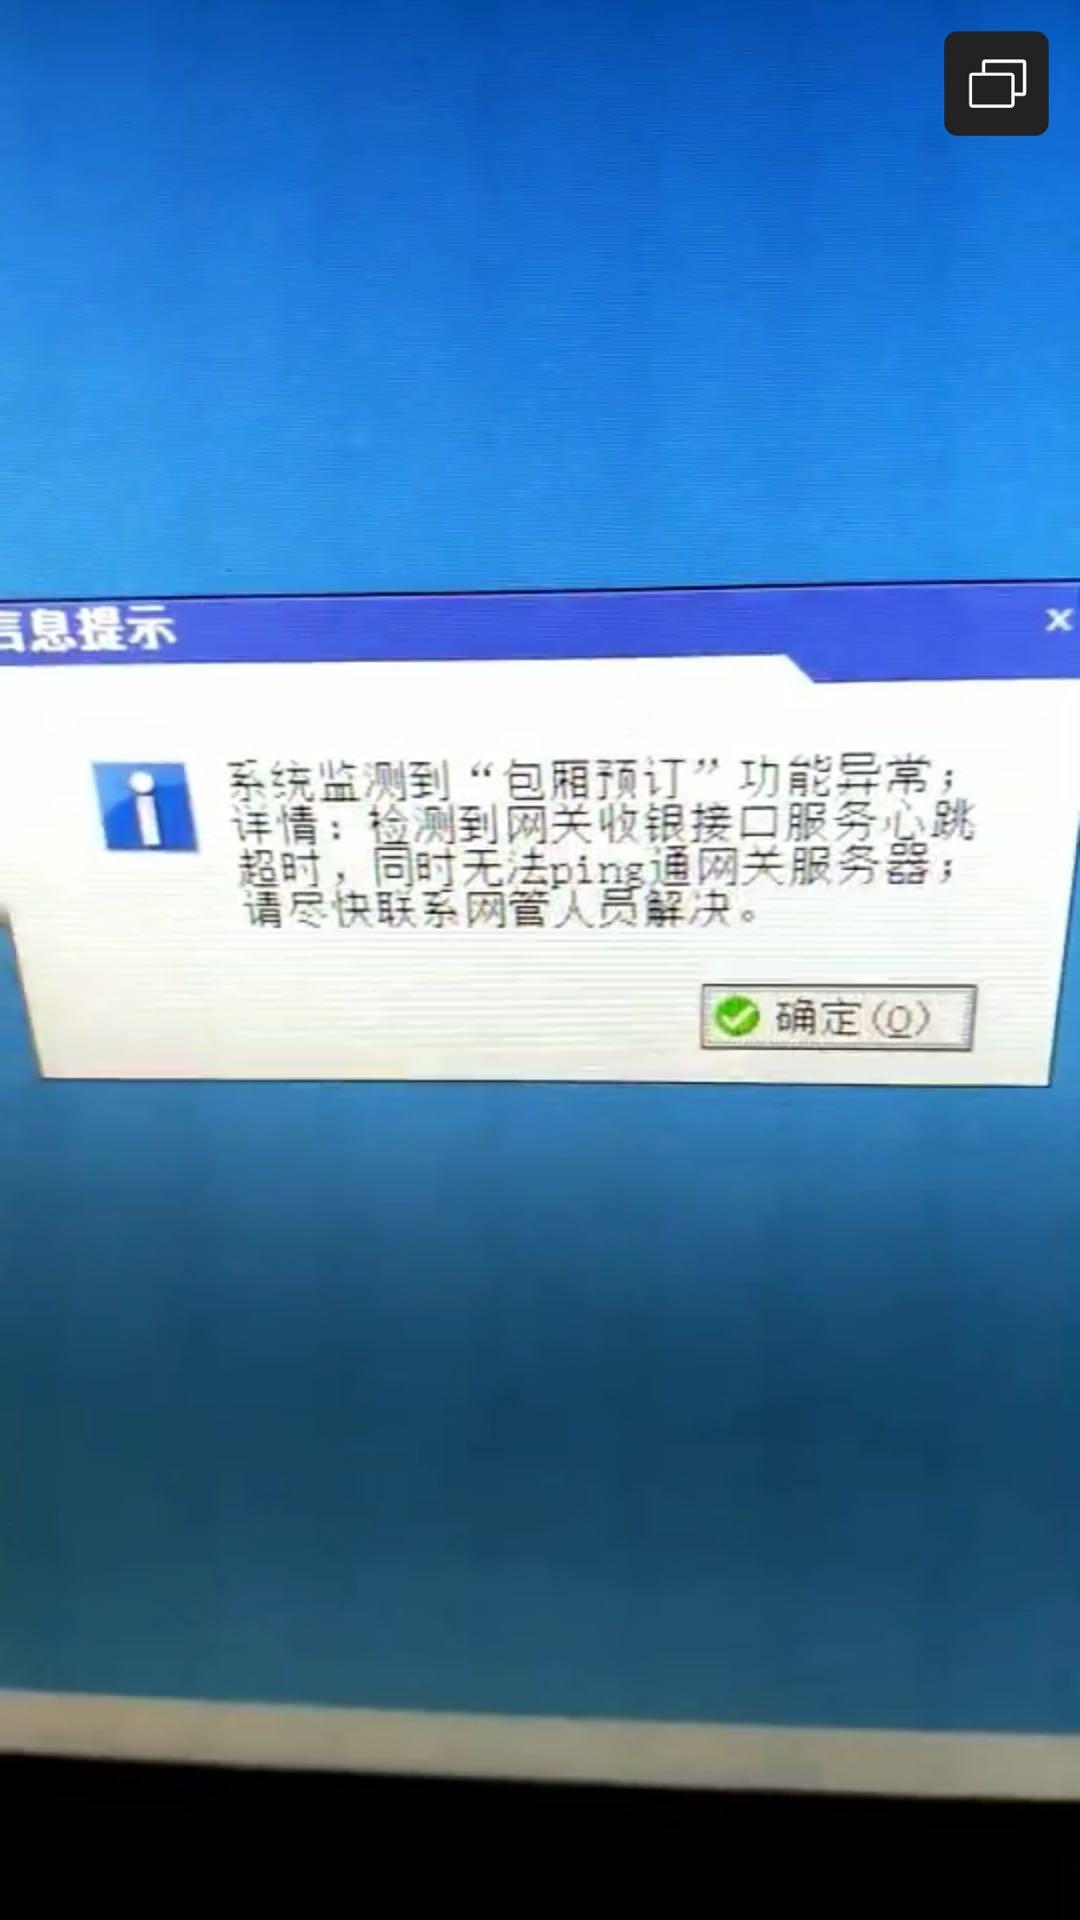 D027731C-9300-450D-BF50-4F11971A48DC.jpeg